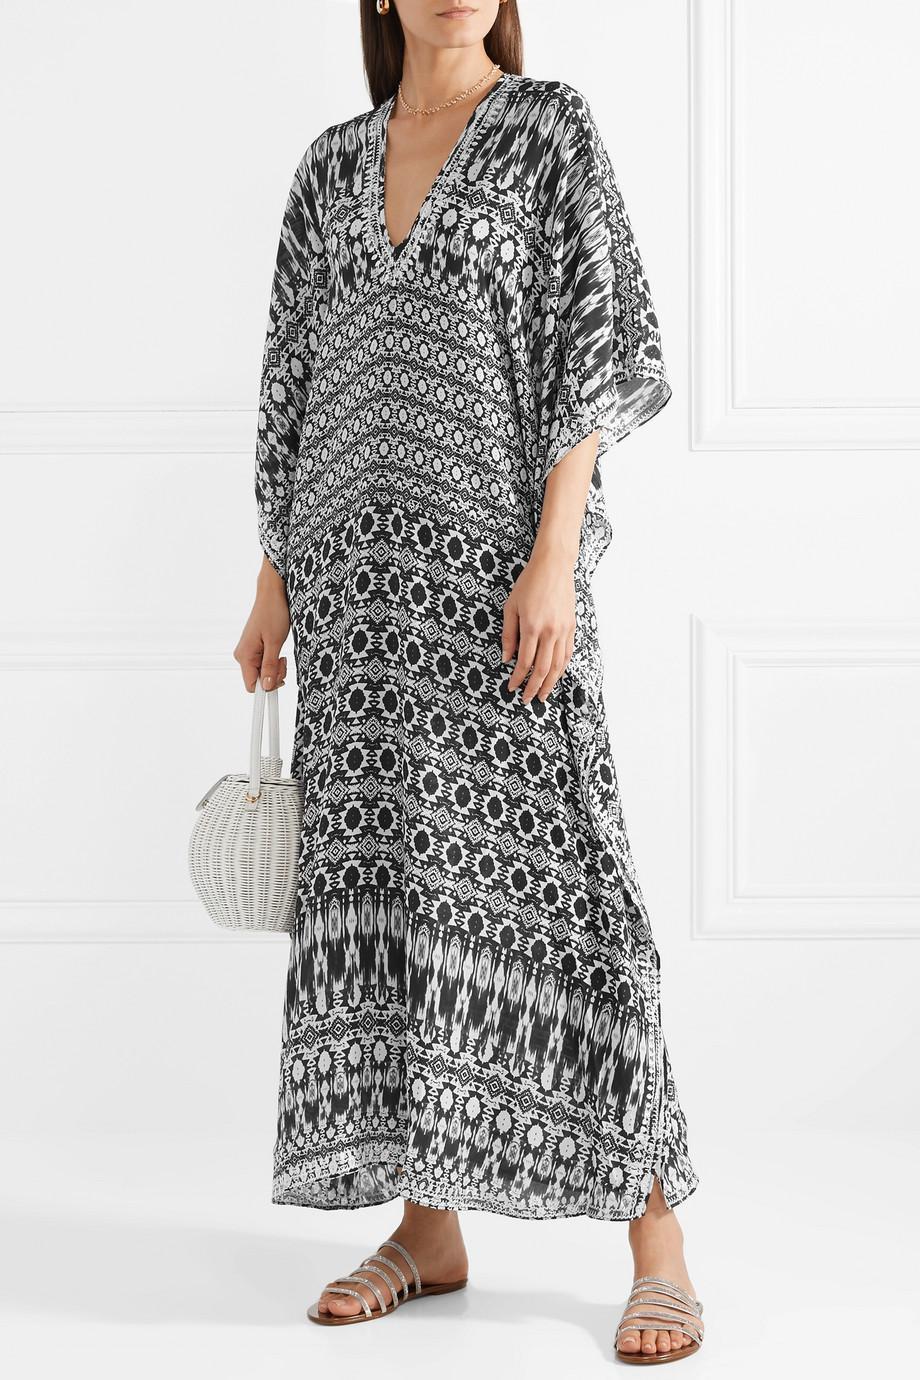 Boubou Embroidered Silk Crepe De Chine Kaftan - Black Marie France Van Damme mbKVnhEVJ8